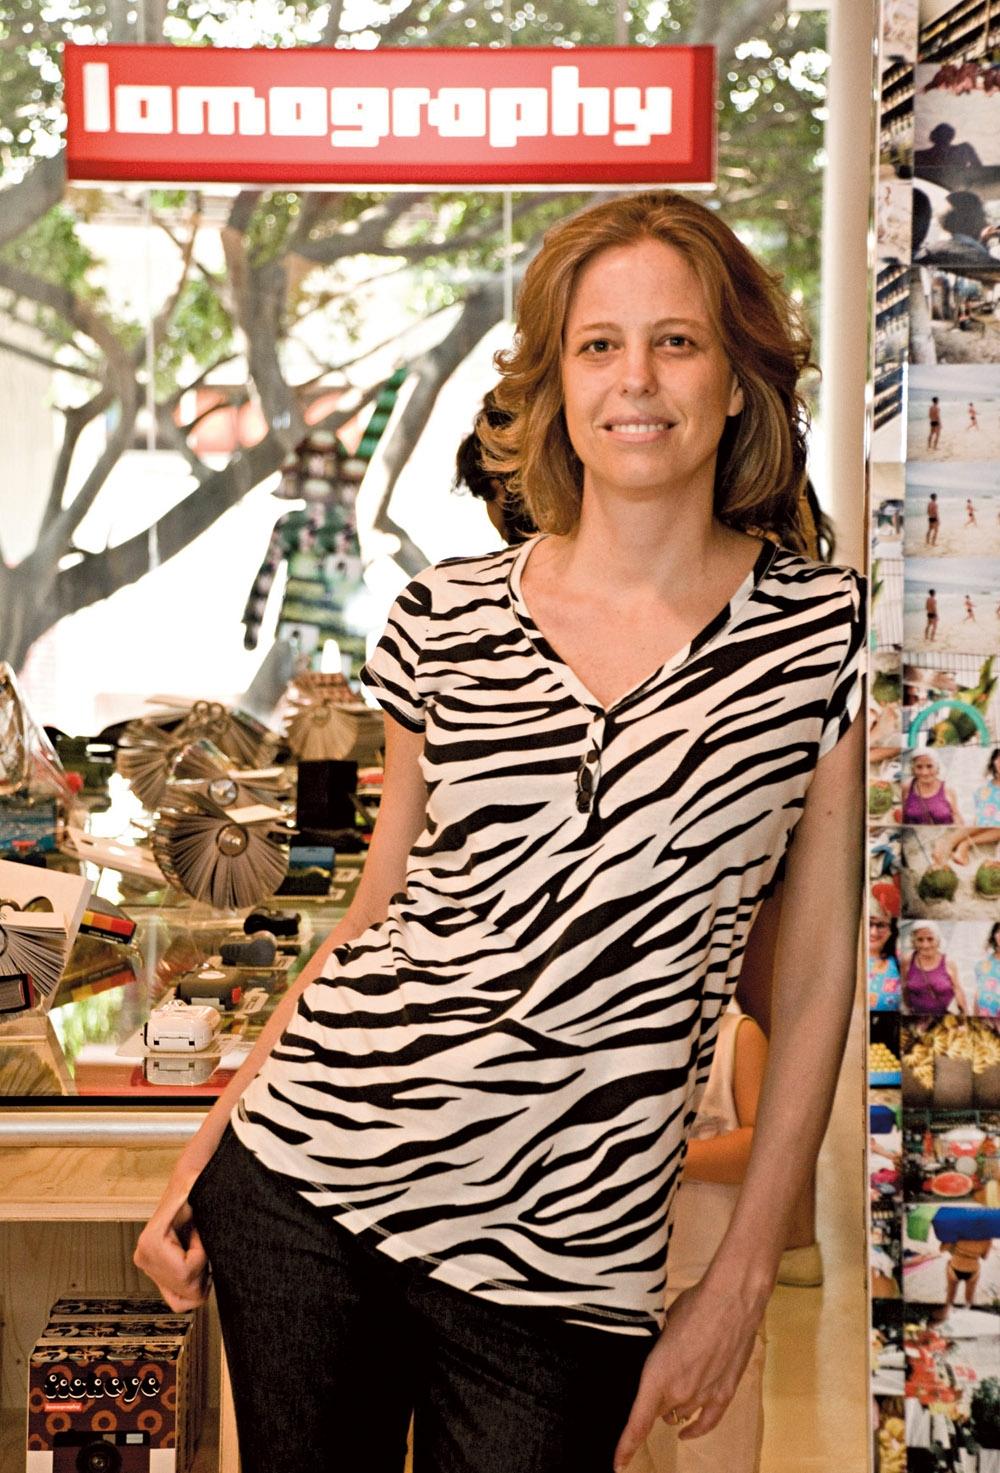 Filipa Richter em sua loja, Lomography